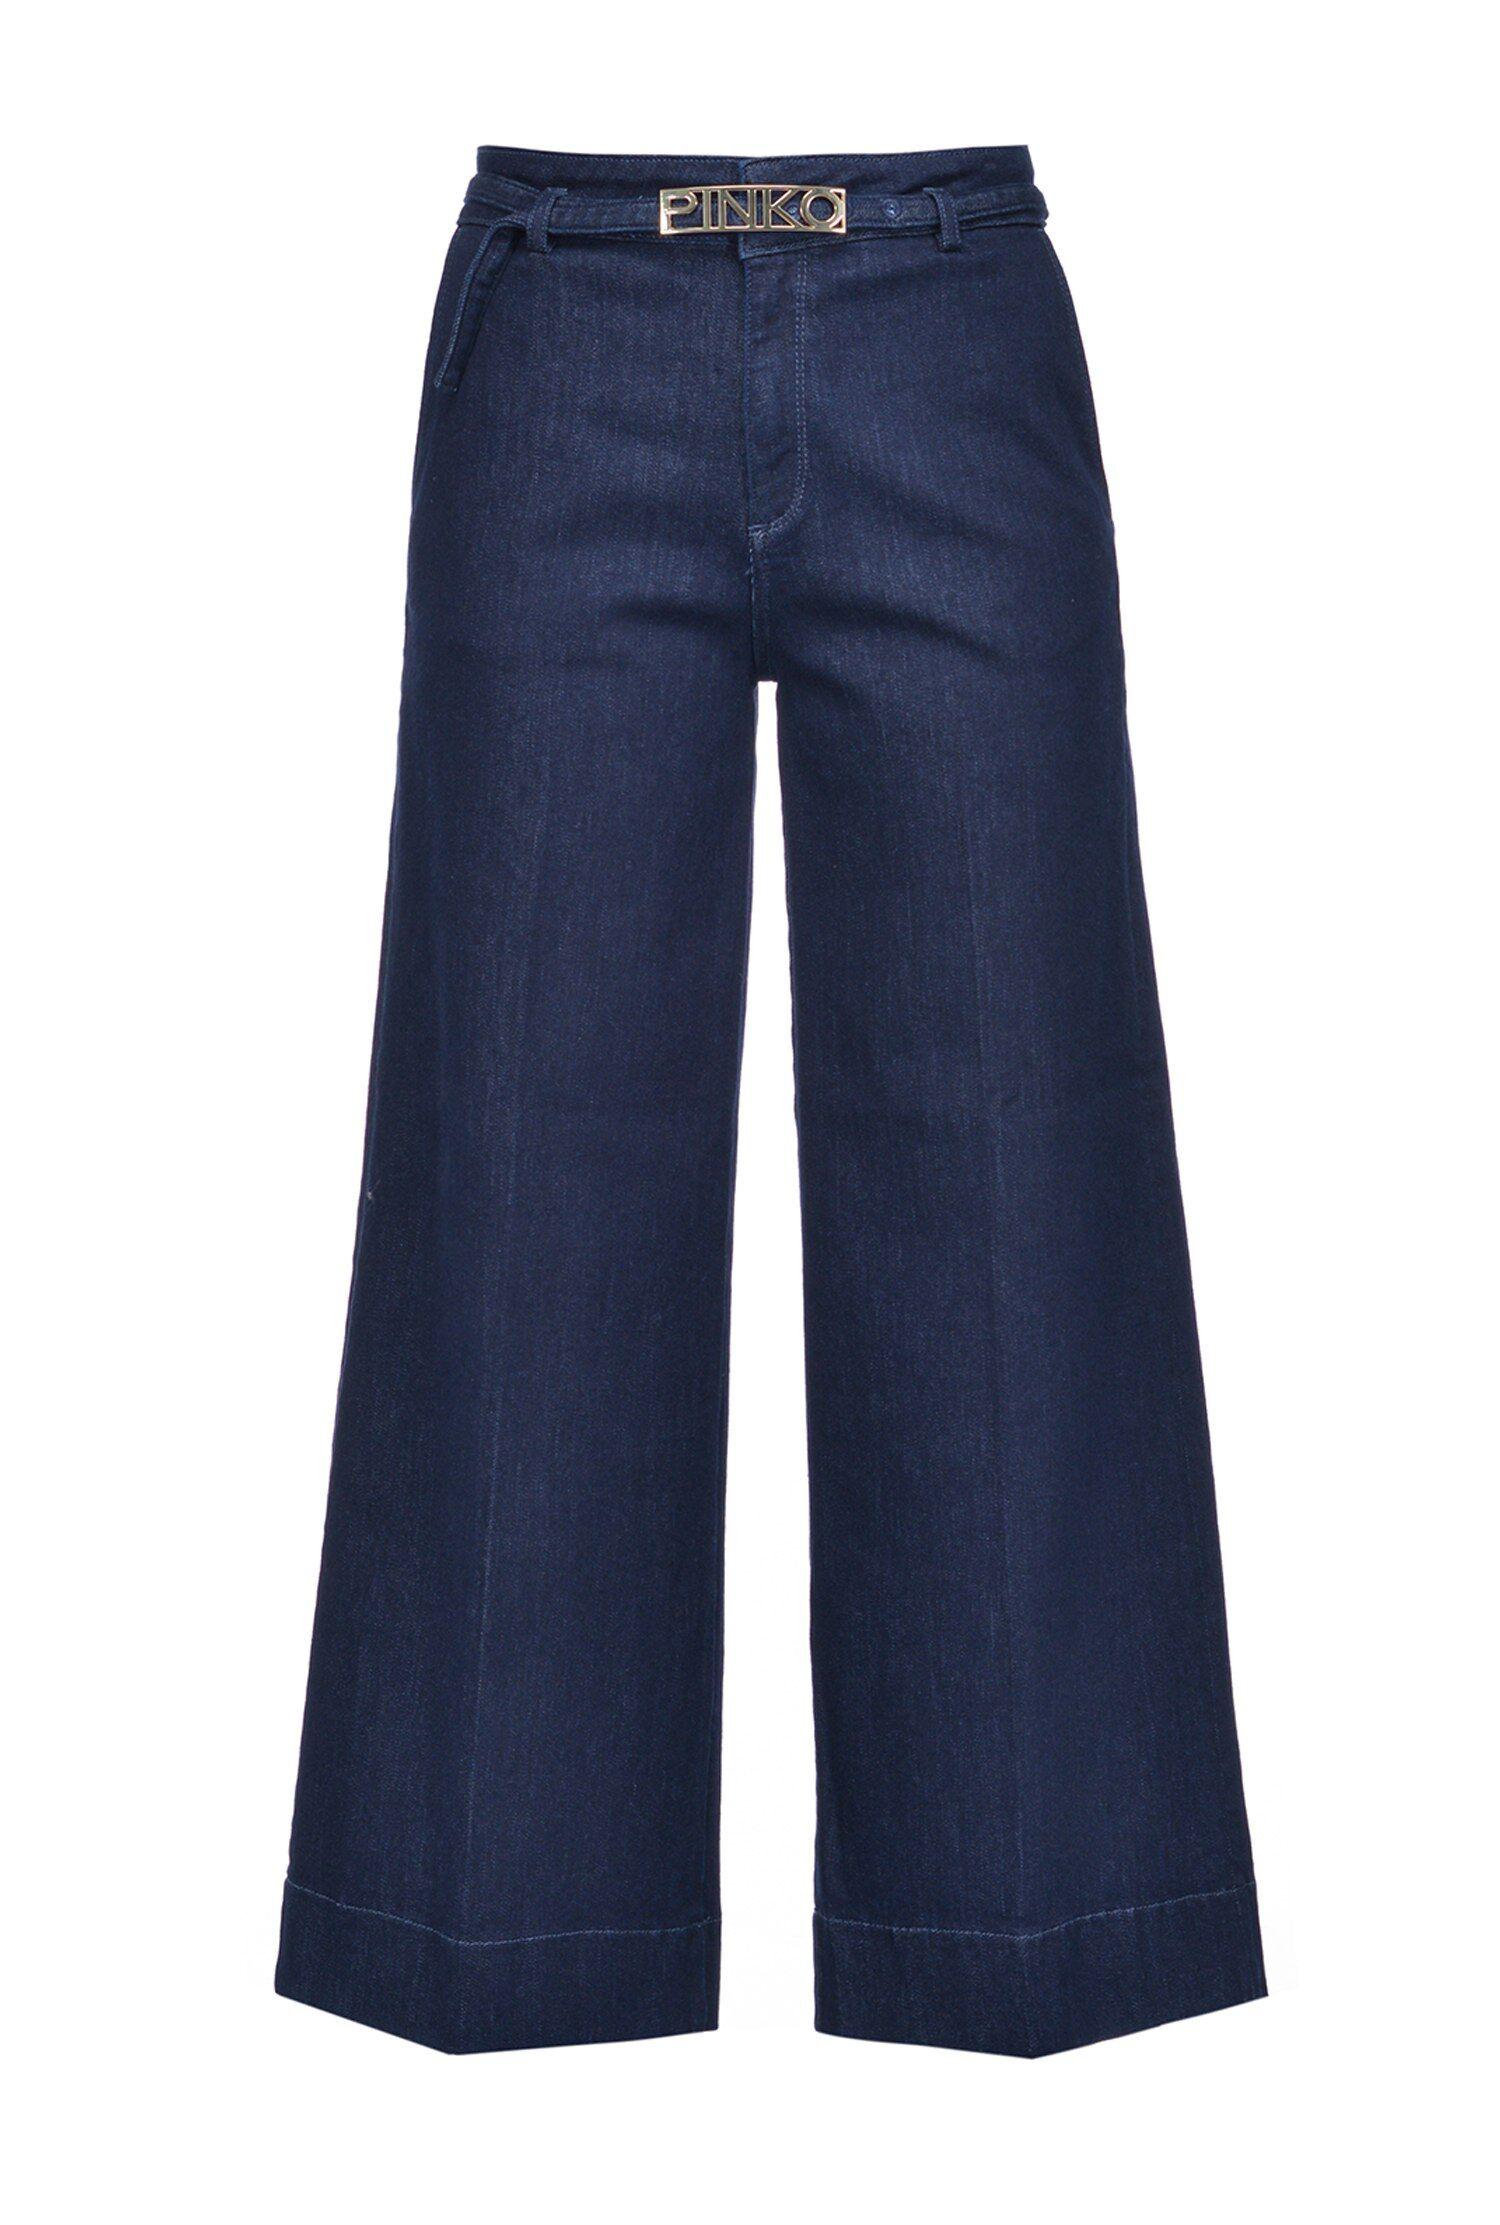 Jeans A Palazzo Slim In Denim Twill Stretch - Pinko